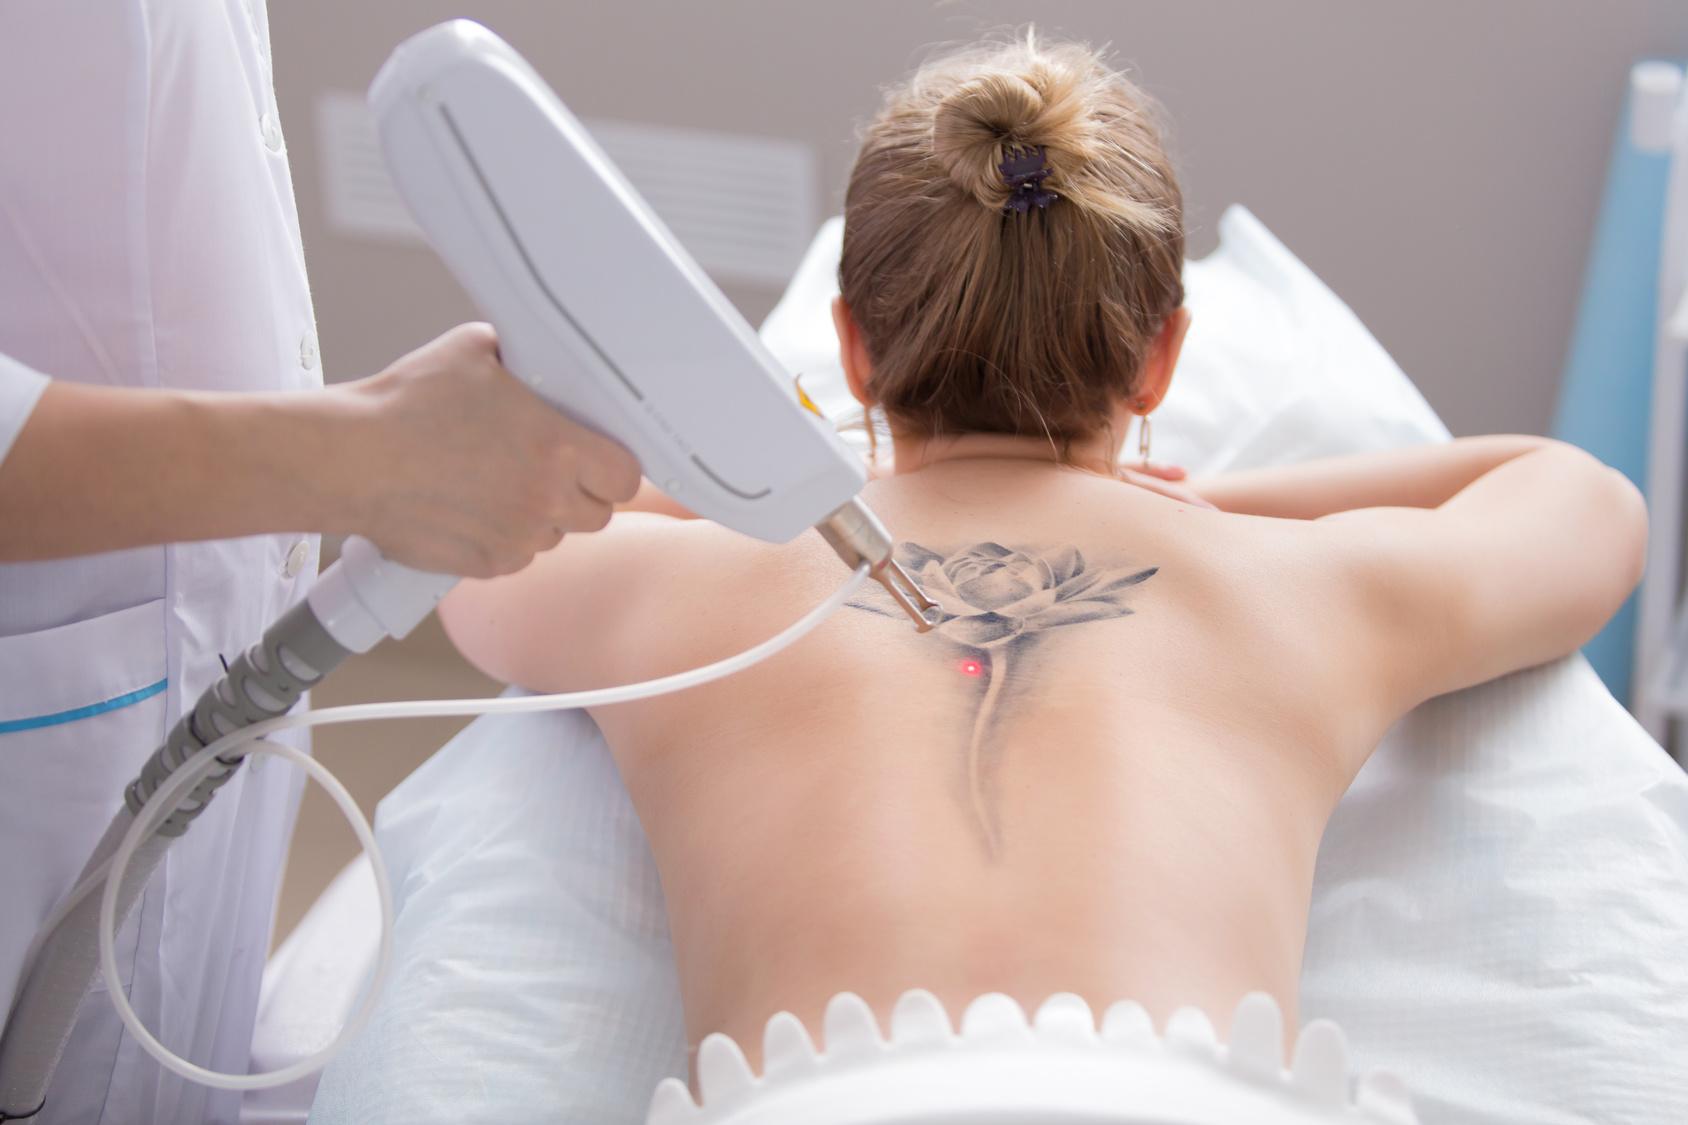 Jak Usunęłam Tatuaż Zabieg Usuwania Tatuażu Krok Po Kroku